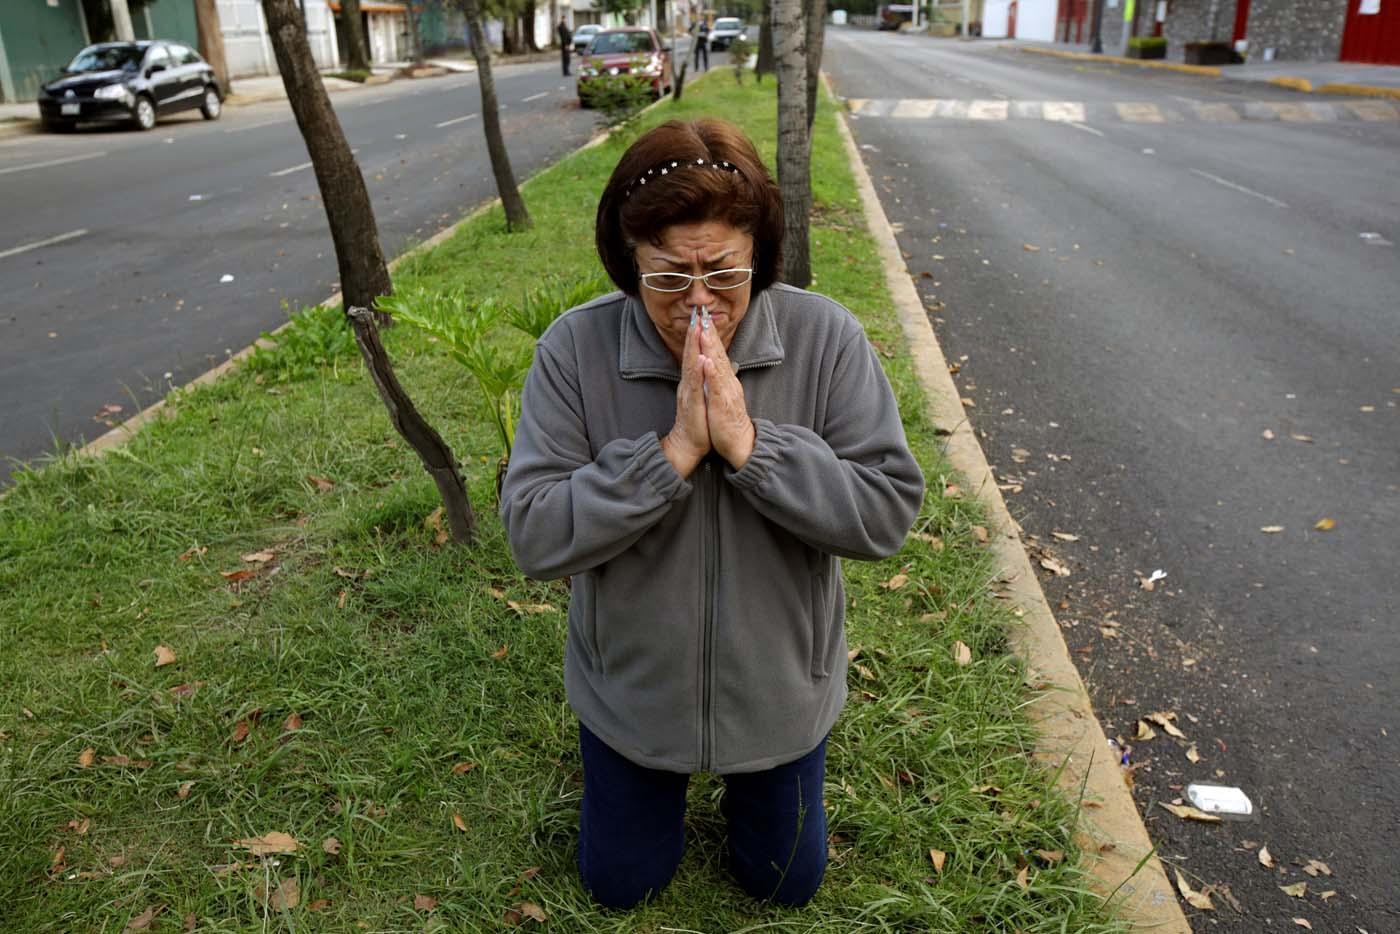 A woman prays after a tremor was felt in Mexico City, Mexico September 23, 2017. REUTERS/Jose Luis Gonzalez